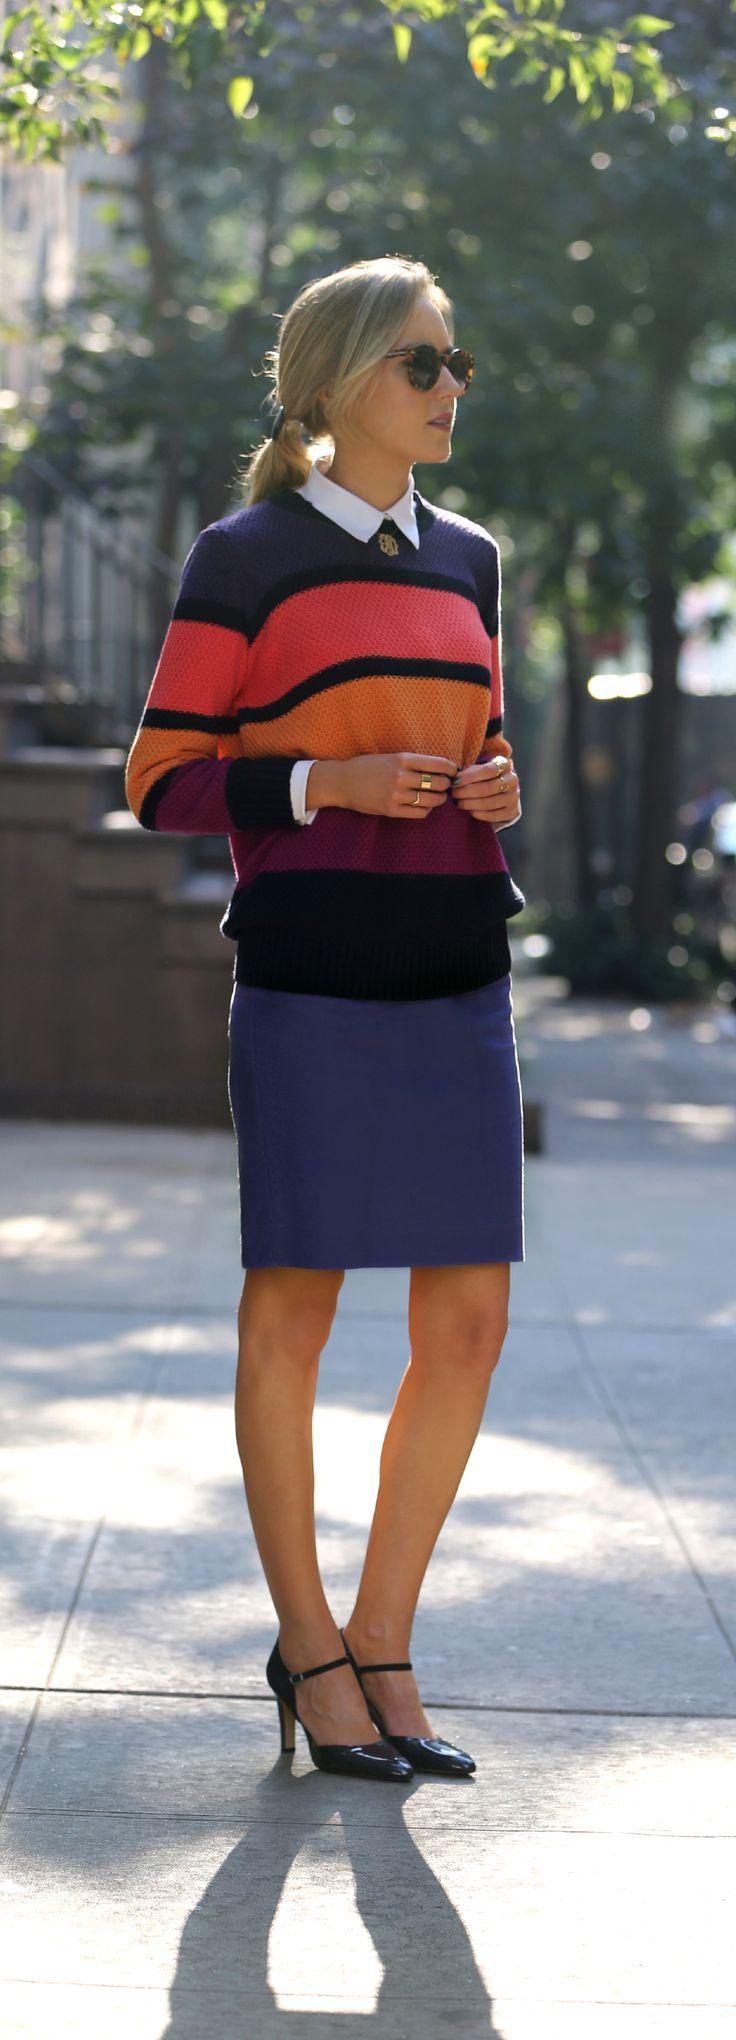 Best 25 brooks brothers women ideas on pinterest party wear blazers brooks brothers and - Brooks brothers corporate office ...